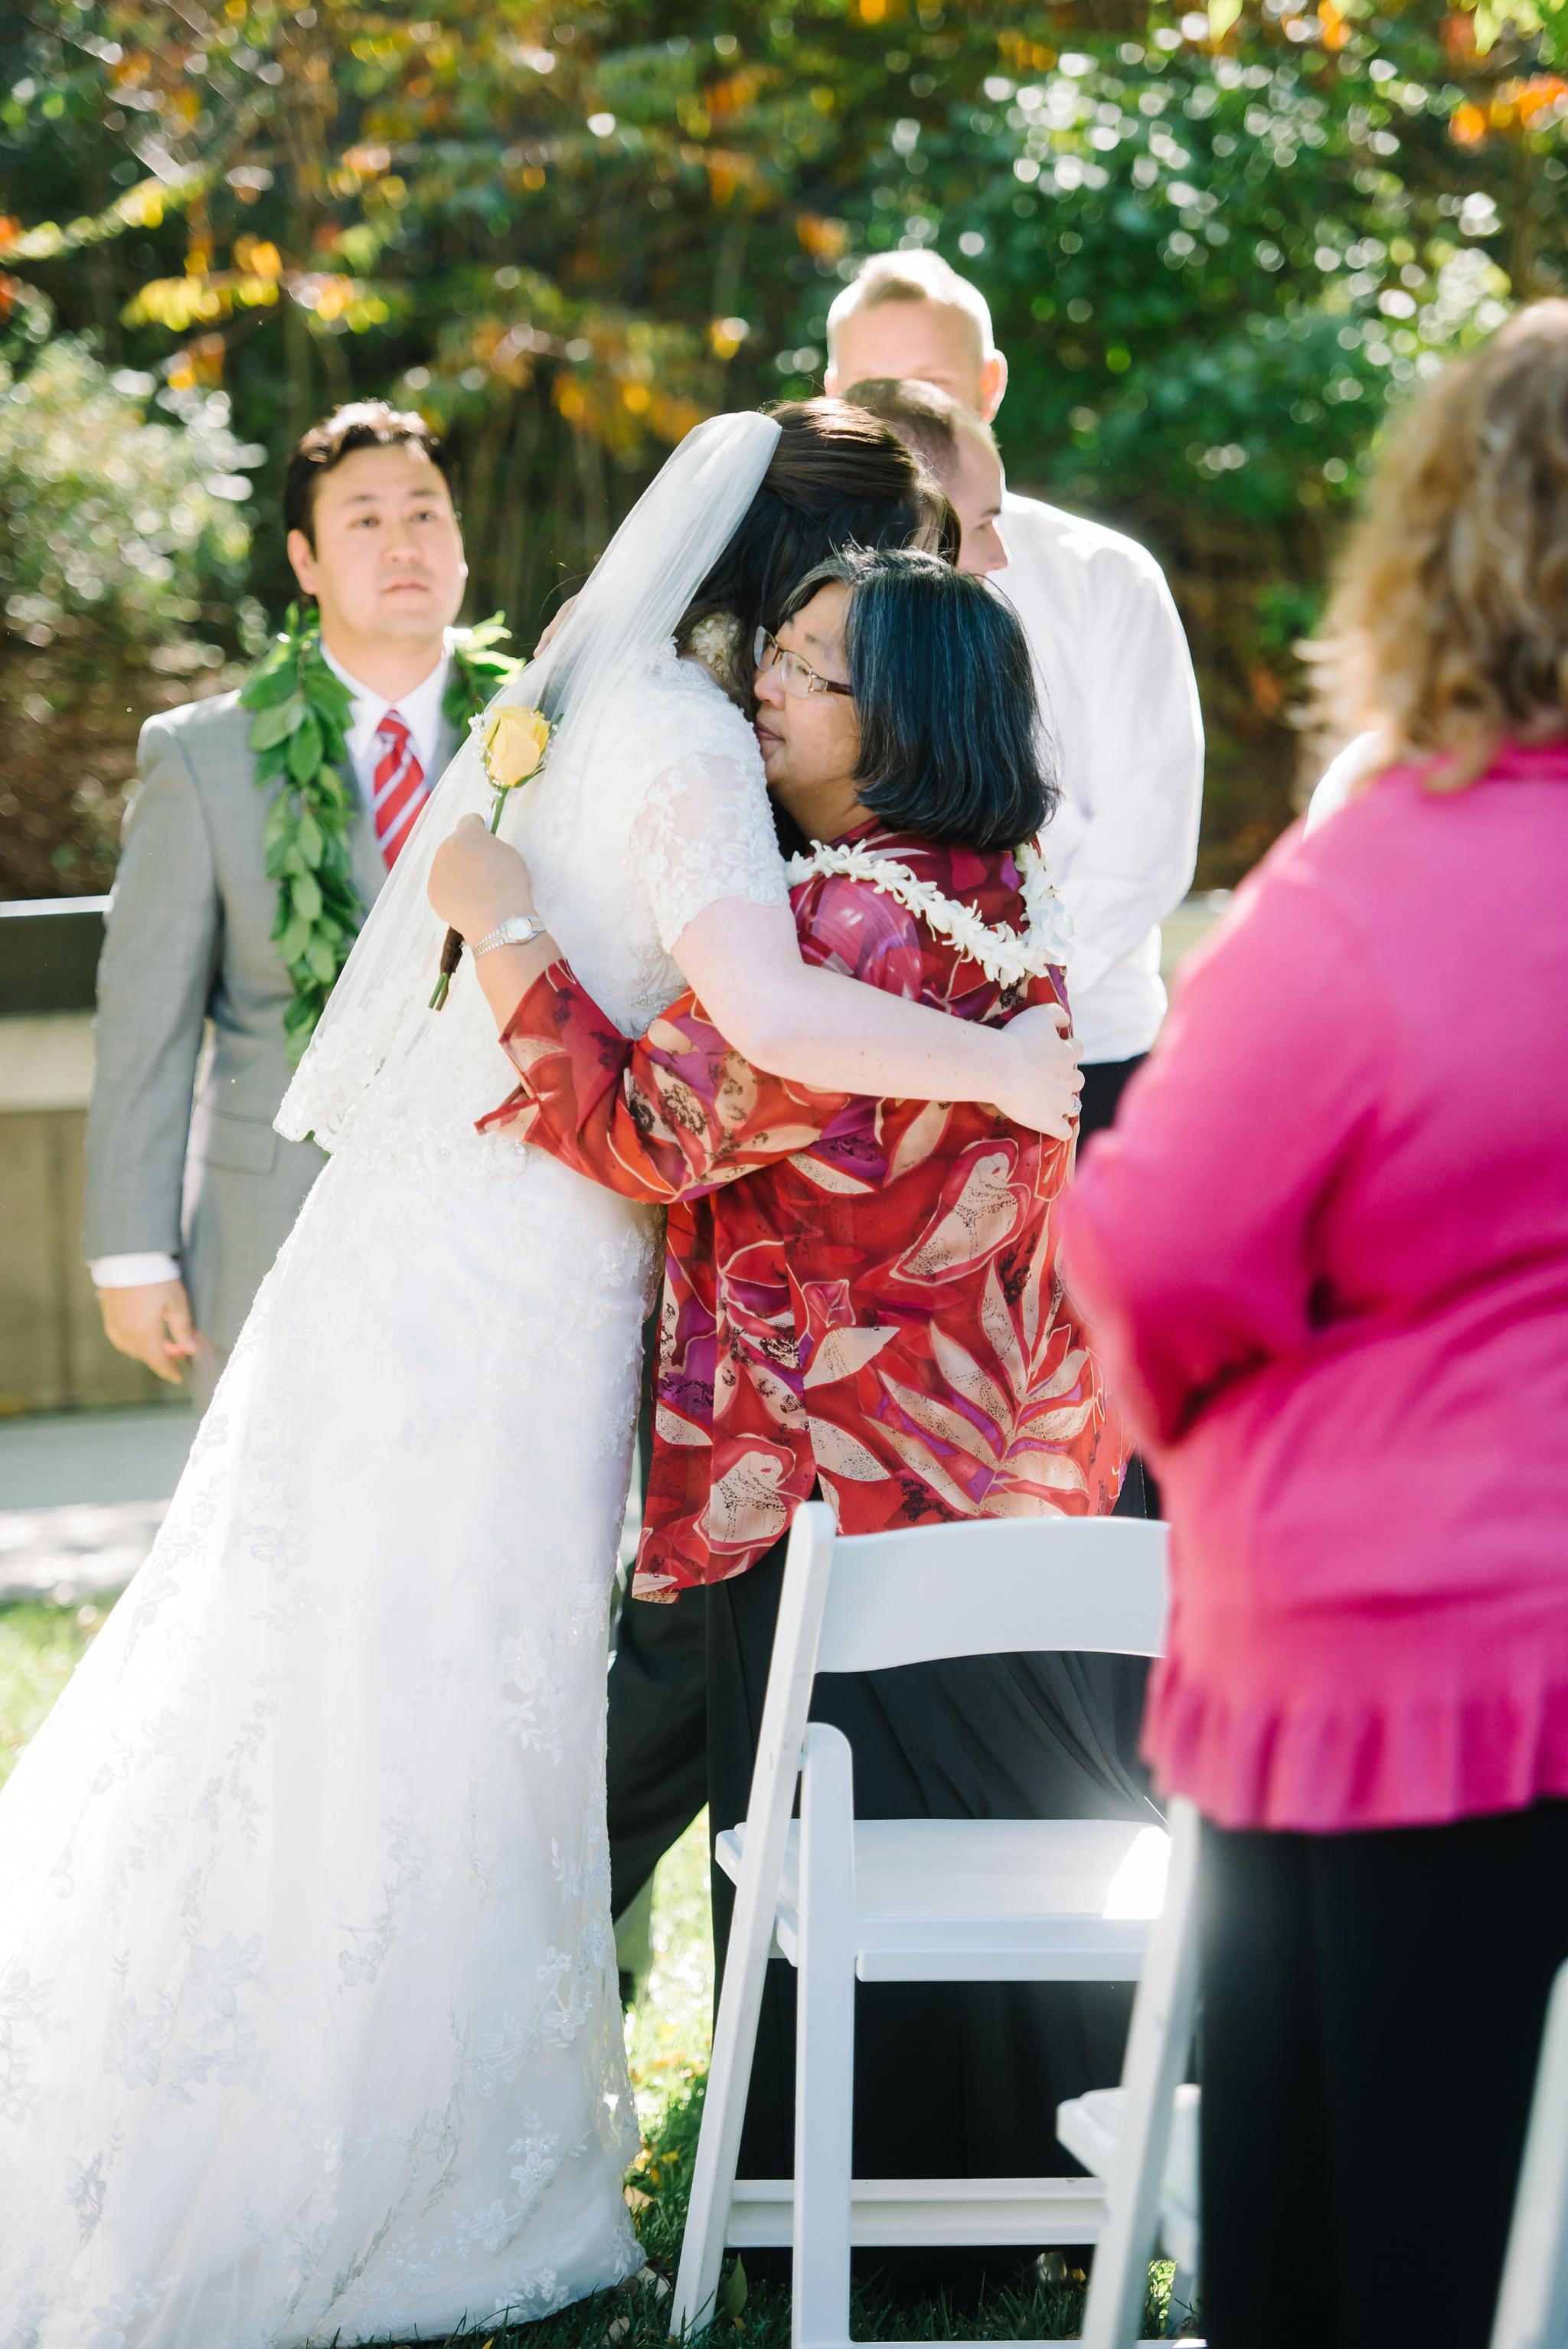 Park City Wedding Photographer Ali Sumsion 032